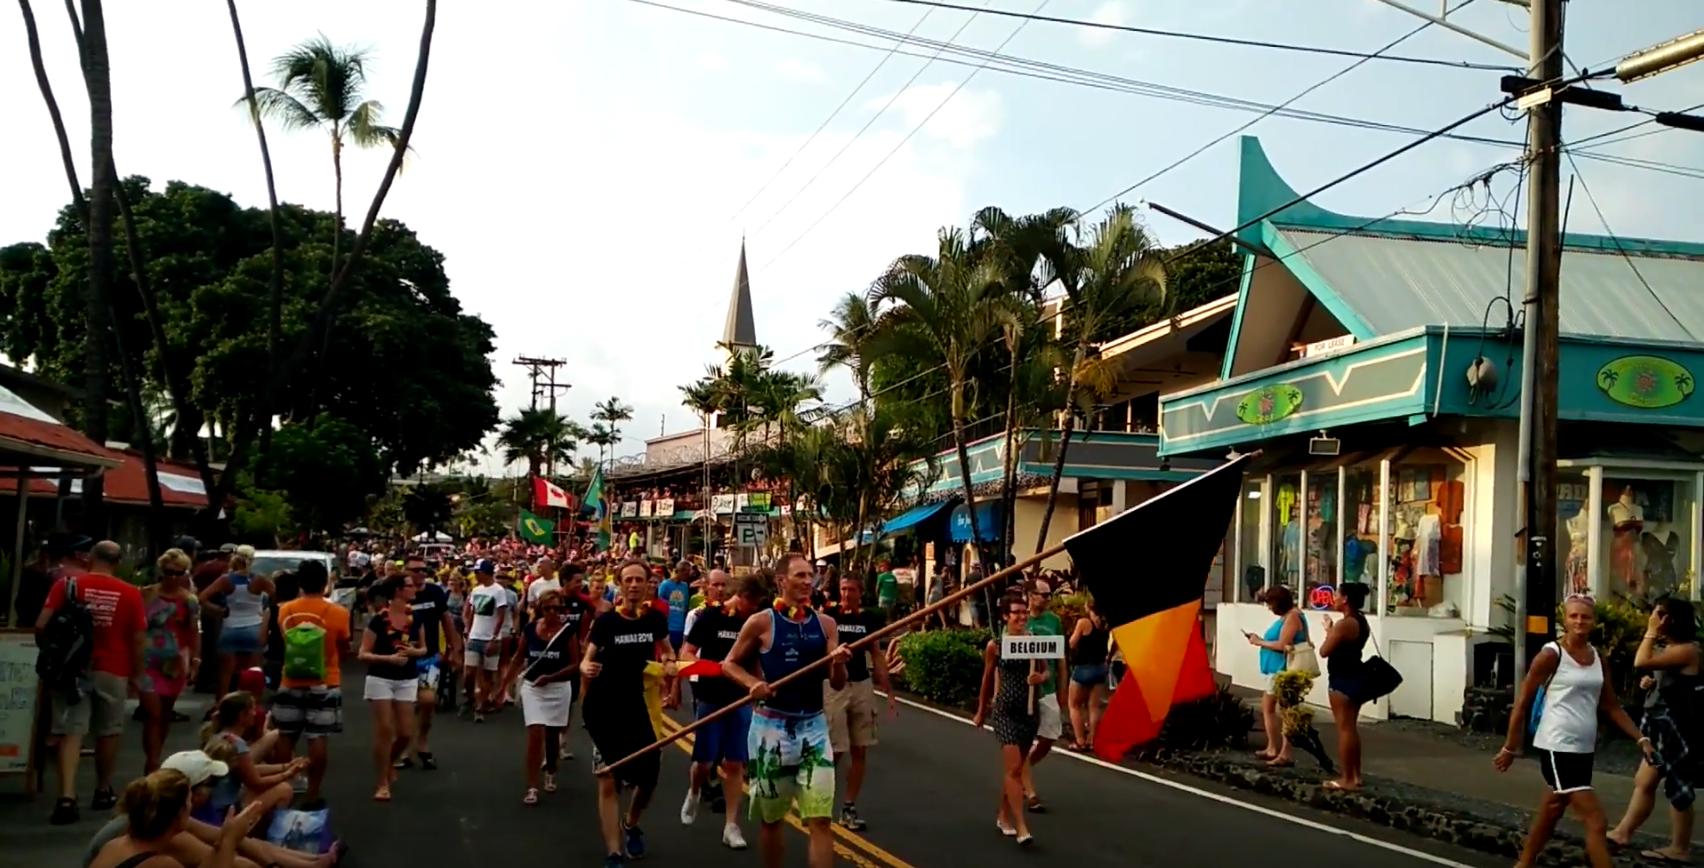 hawaii-2016-nations-parade-belgie-youtube